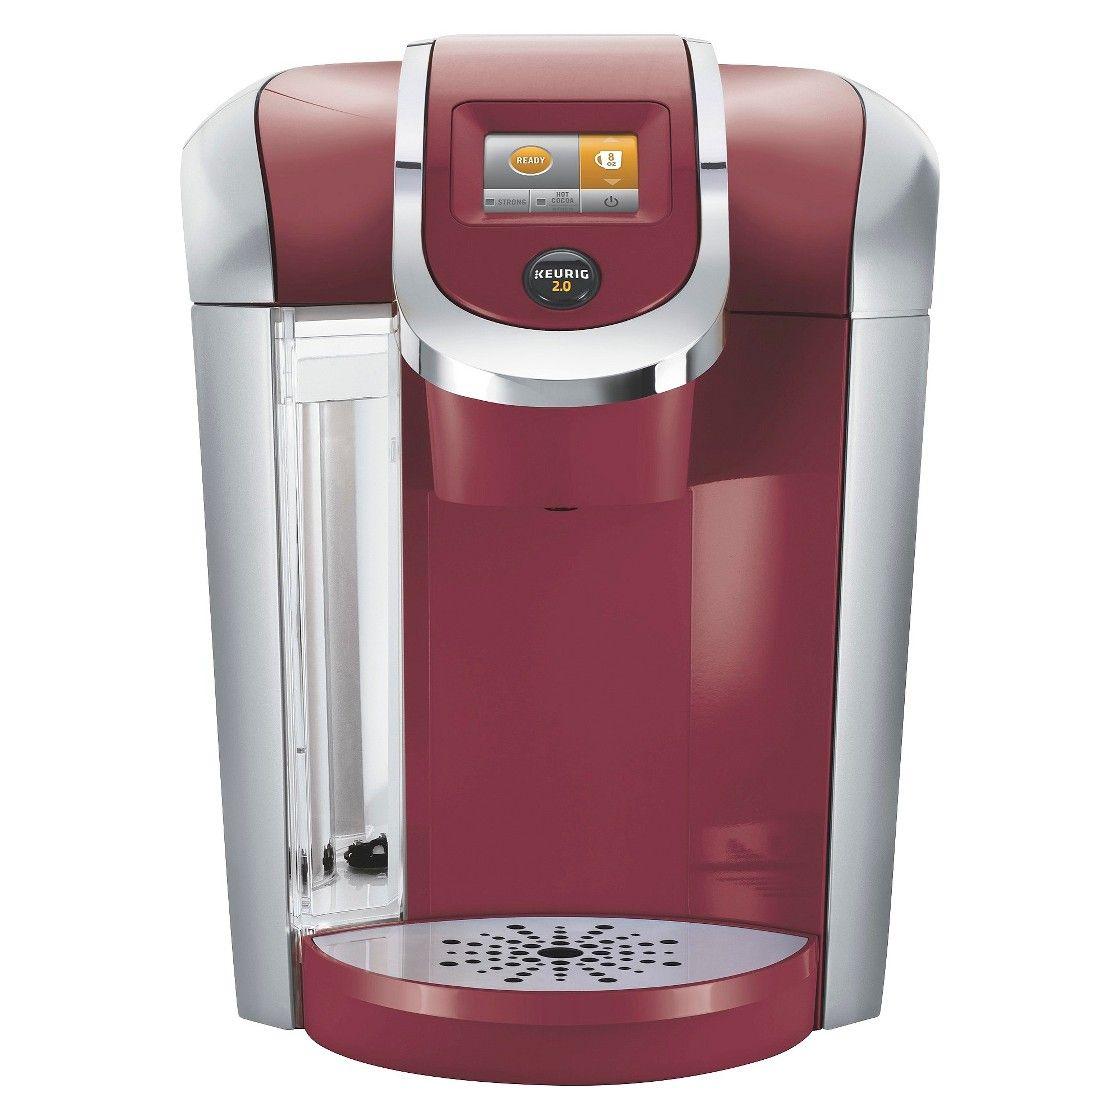 Keurig 20 k400 coffee maker brewing system with carafe